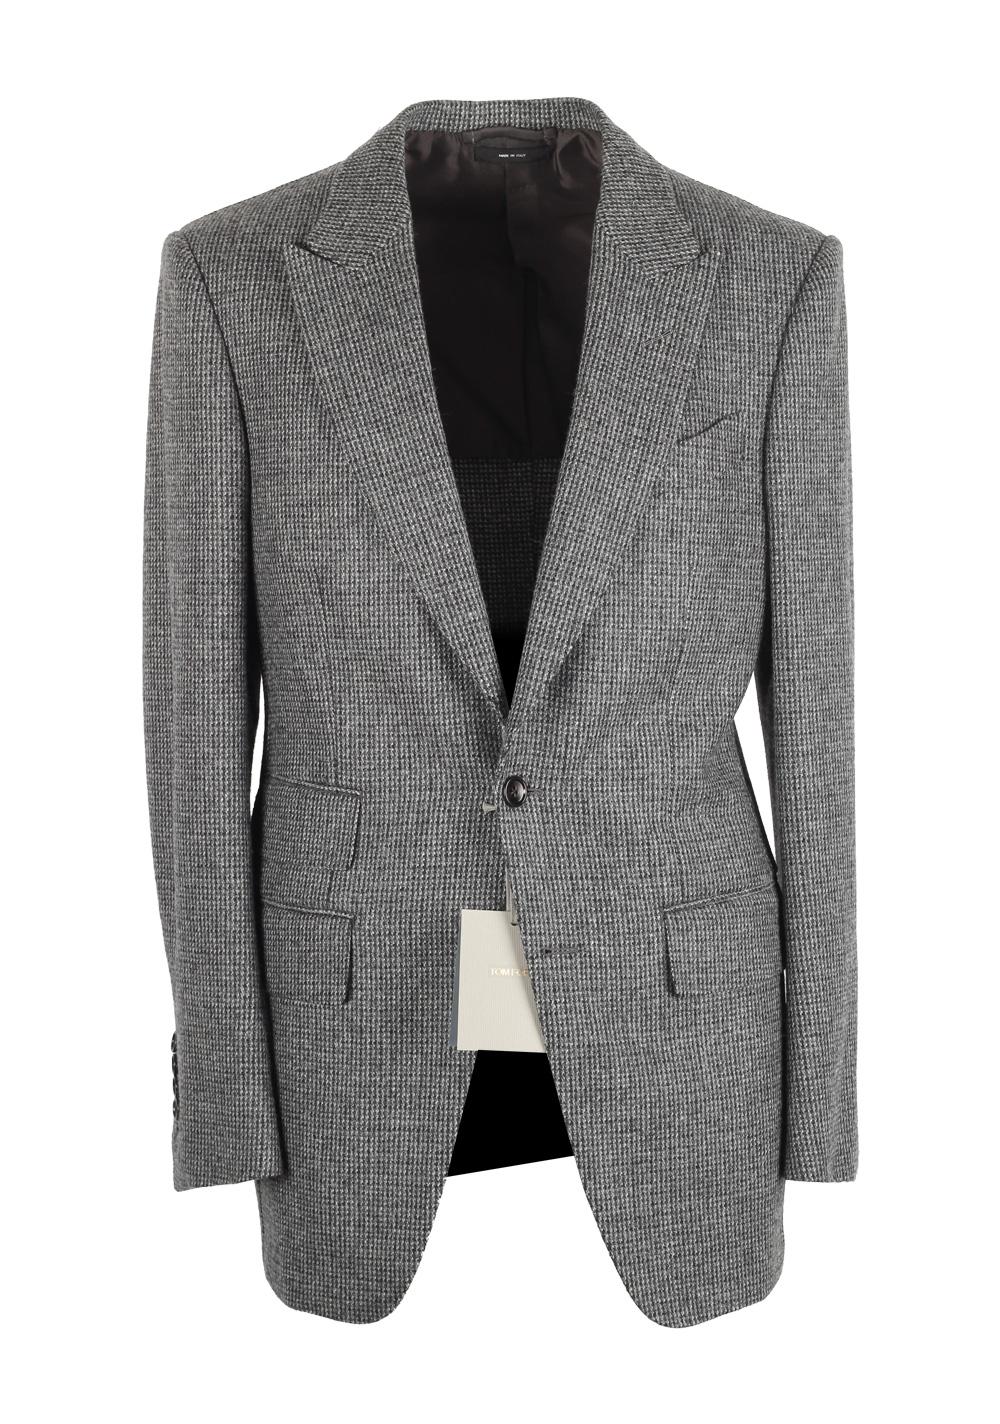 TOM FORD Atticus Gray Sport Coat Size 46 / 36R U.S. | Costume Limité